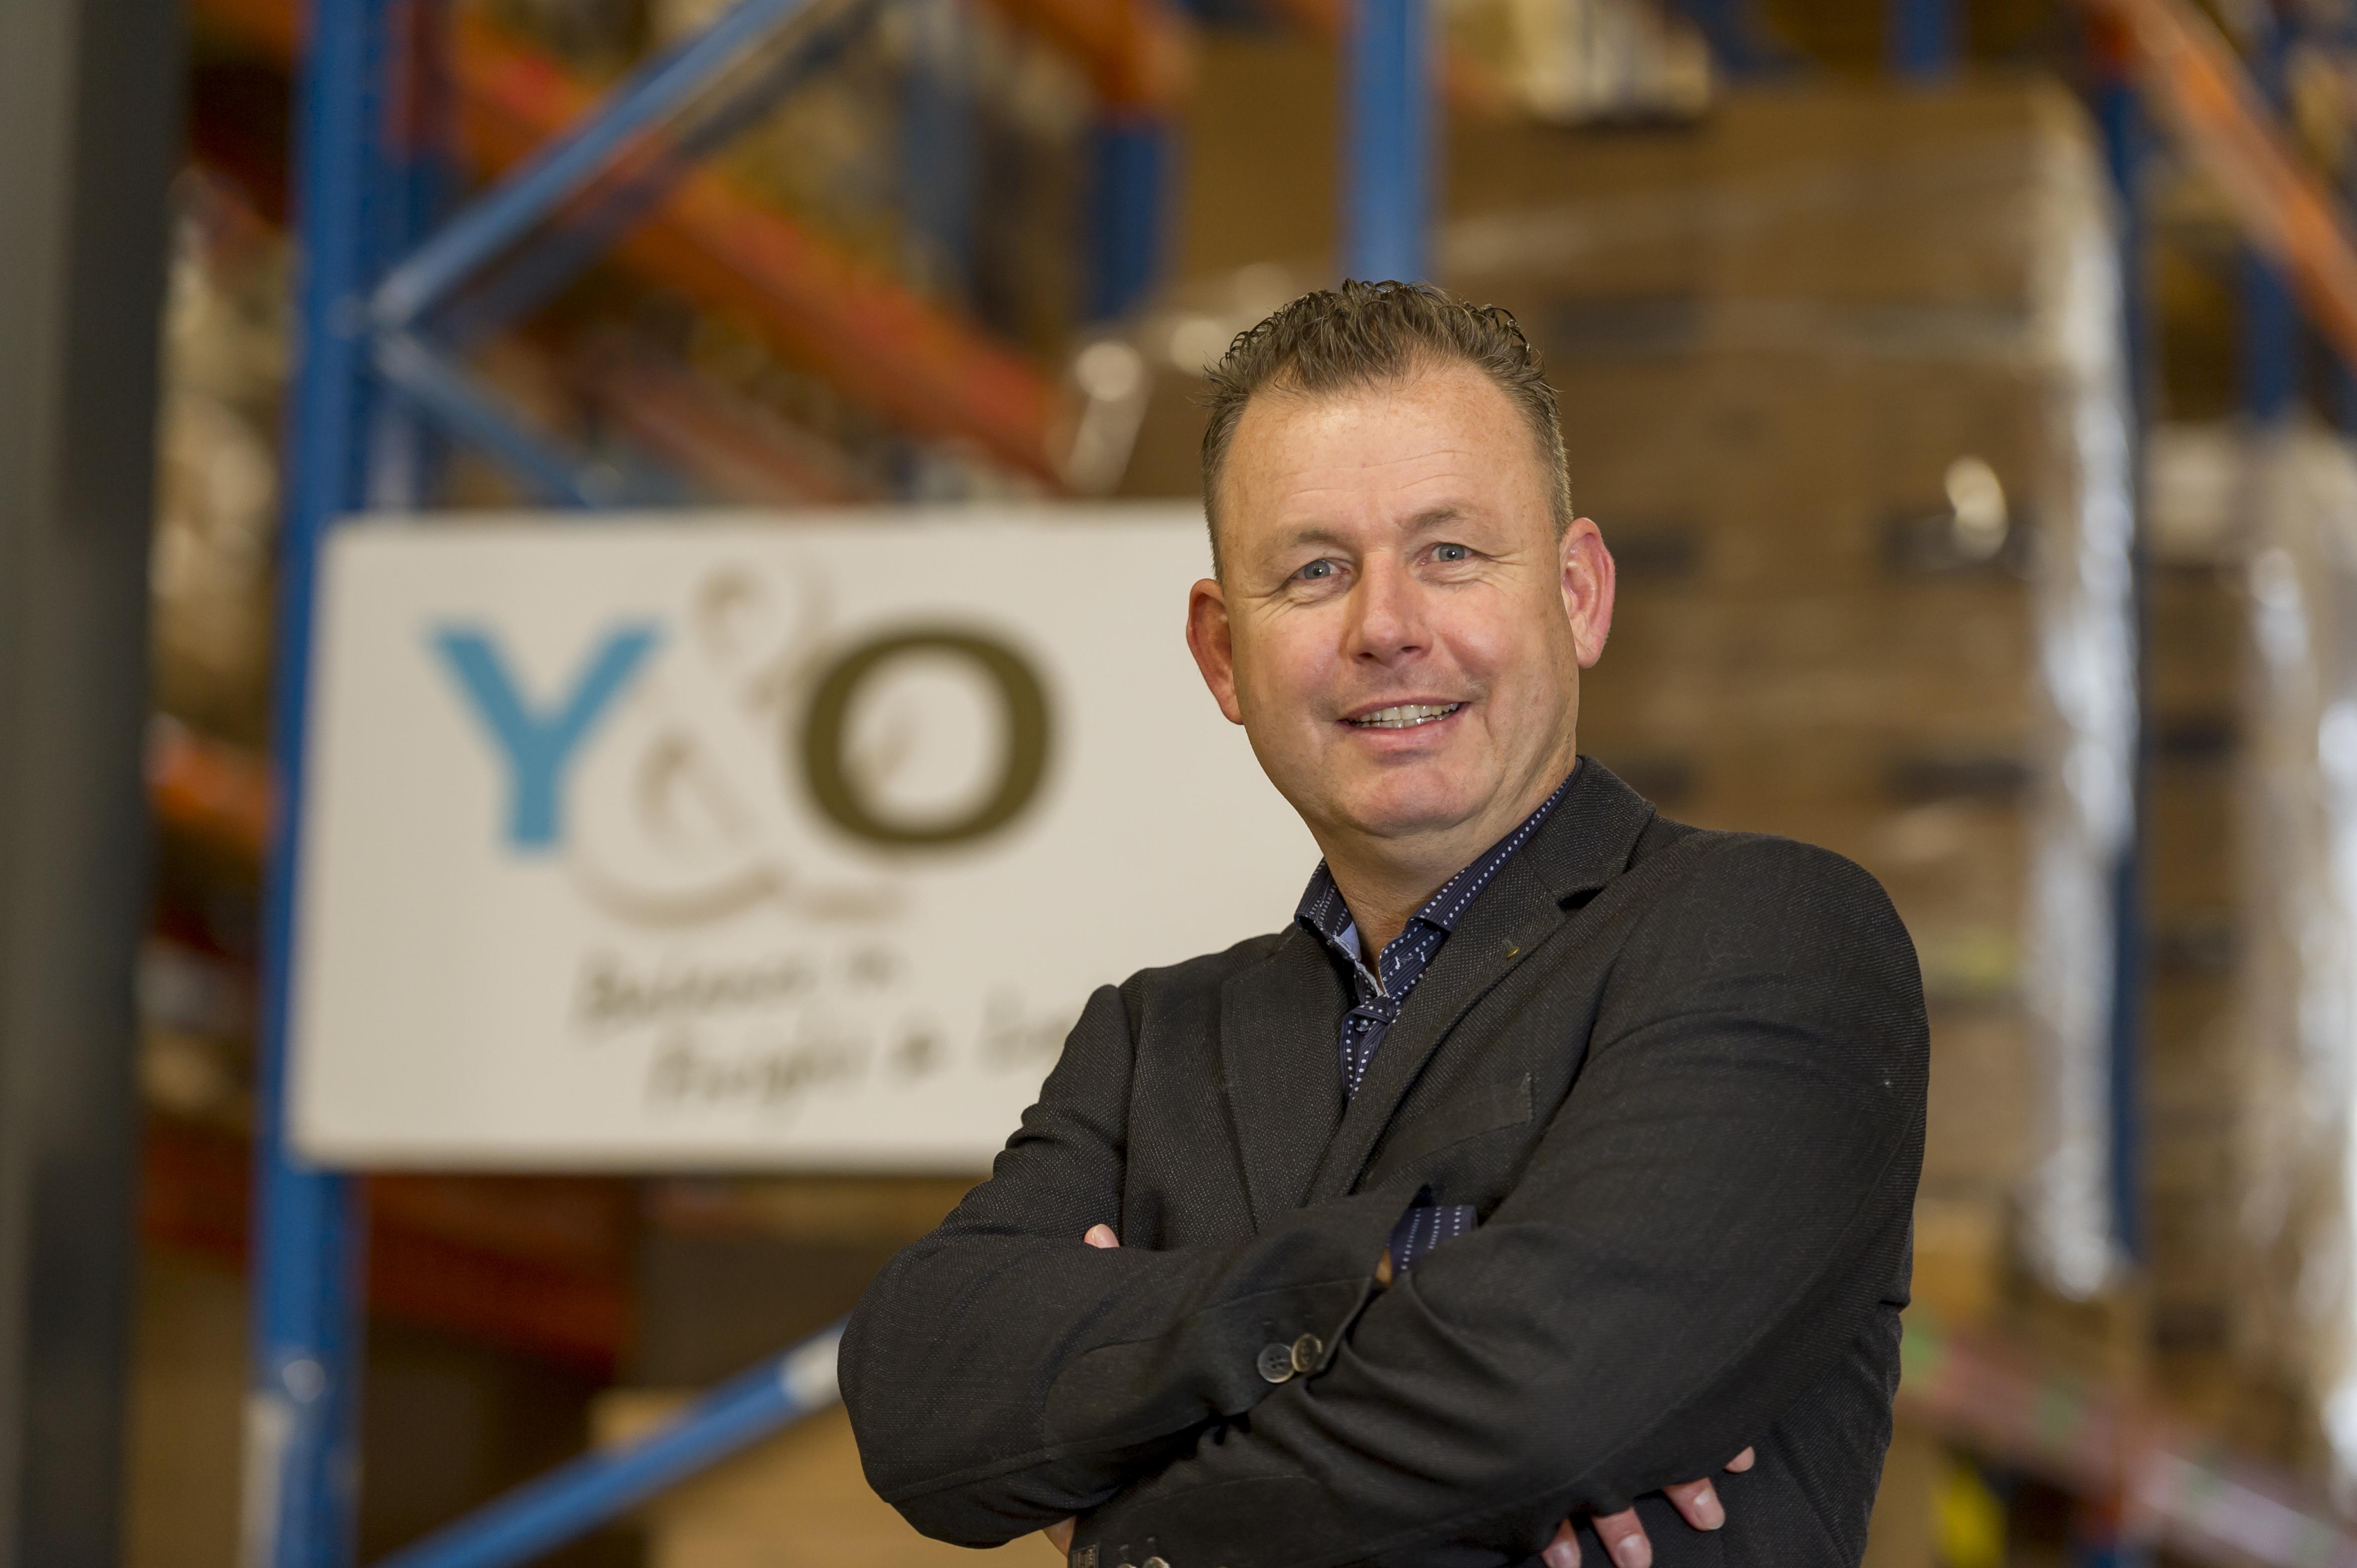 Yvo Huntjens, Y&O Freight Logistics